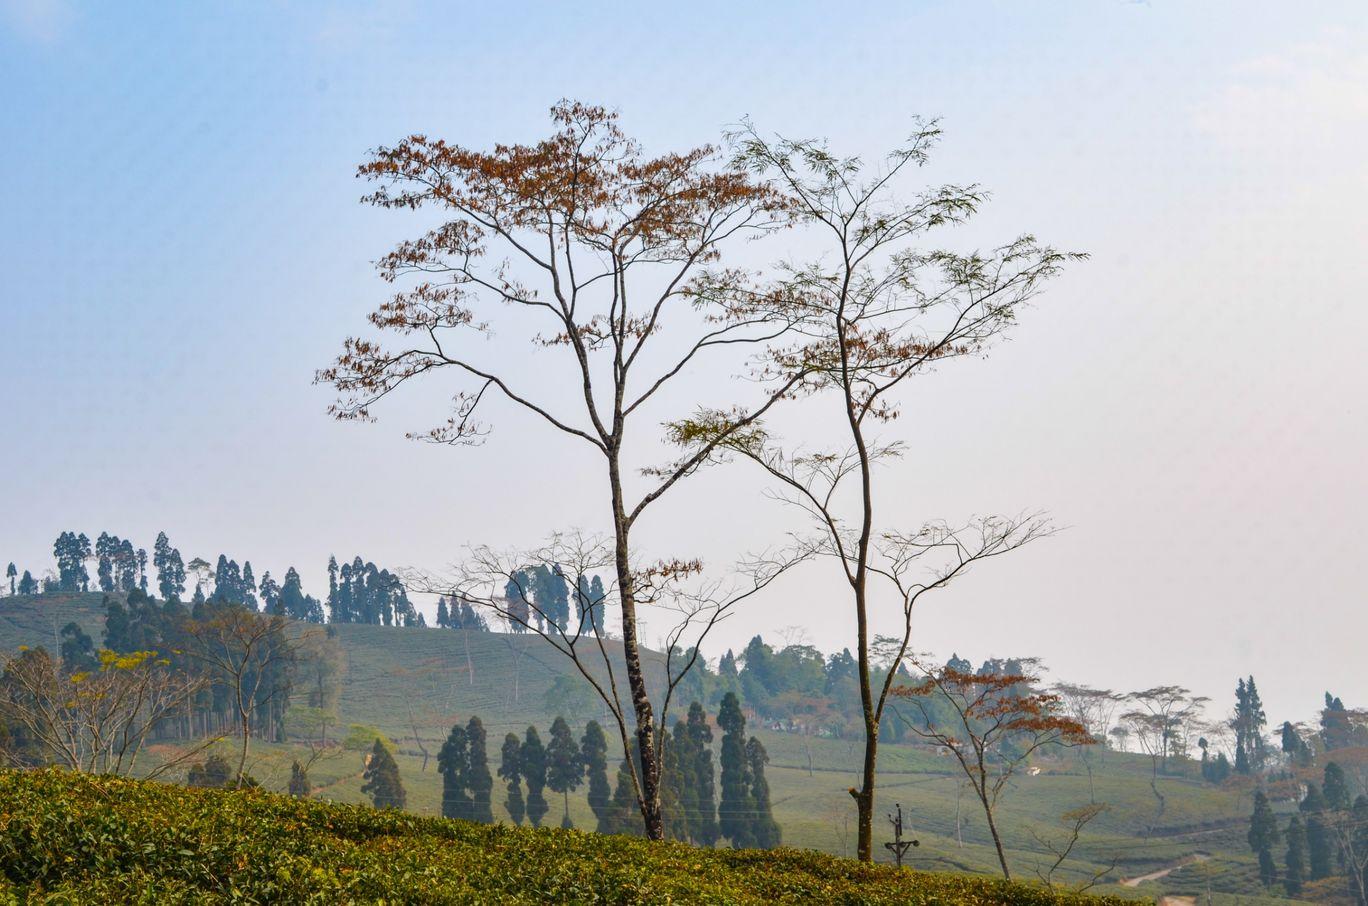 Photo of Takdah By Bongyatri - Sourav and Anindita